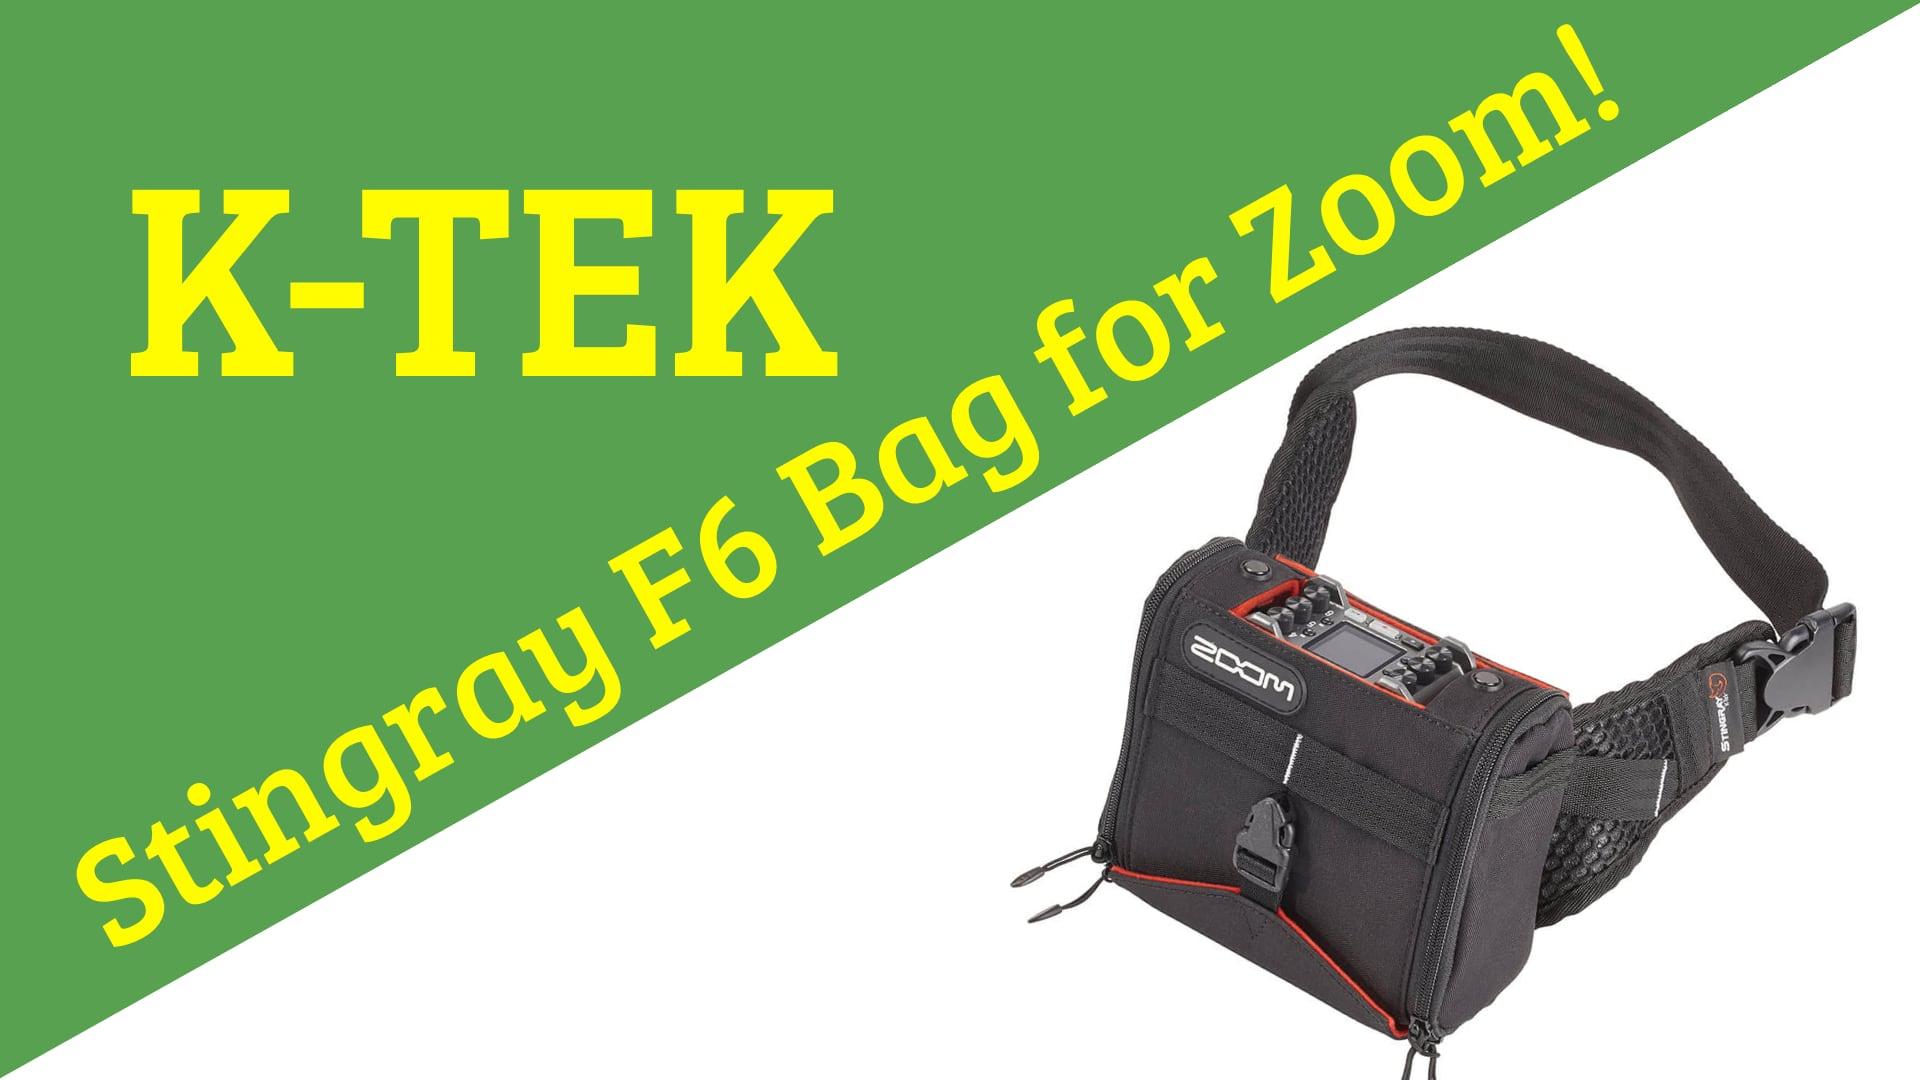 First Look: K-Tek Stingray Zoom F6 Bag